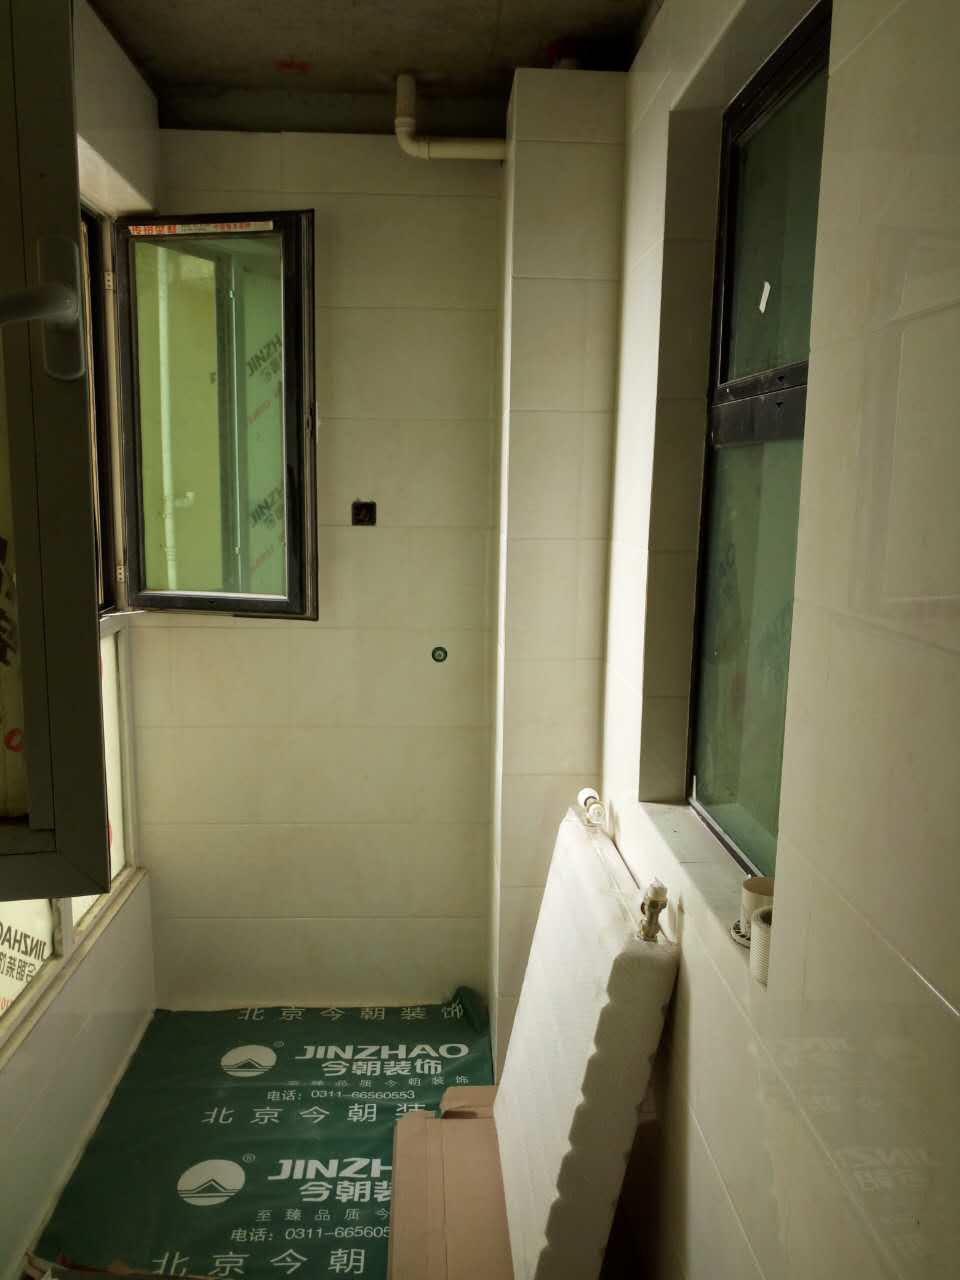 ballbet贝博登陆_鑫界王府三室一厅ballbet贝博网址工地瓦工阶段有序进行中,工人贴砖细致,留缝恰当,符合公司标准。